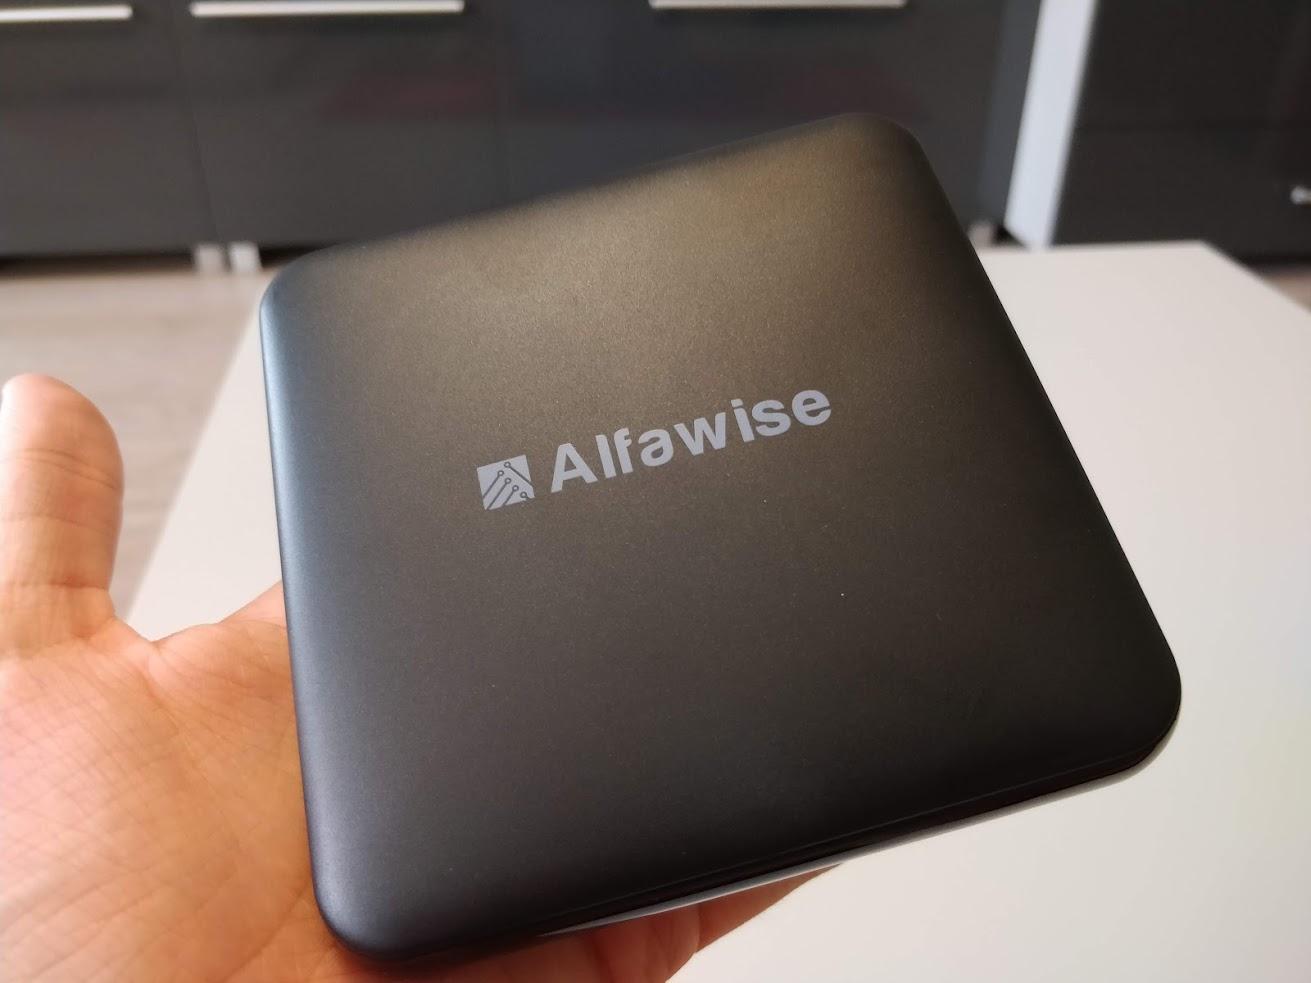 alfawise-s95-tv-box-okosito-android-7.1.2-amlogic-4-mag-2-gb-ram-16-gb-rom 4